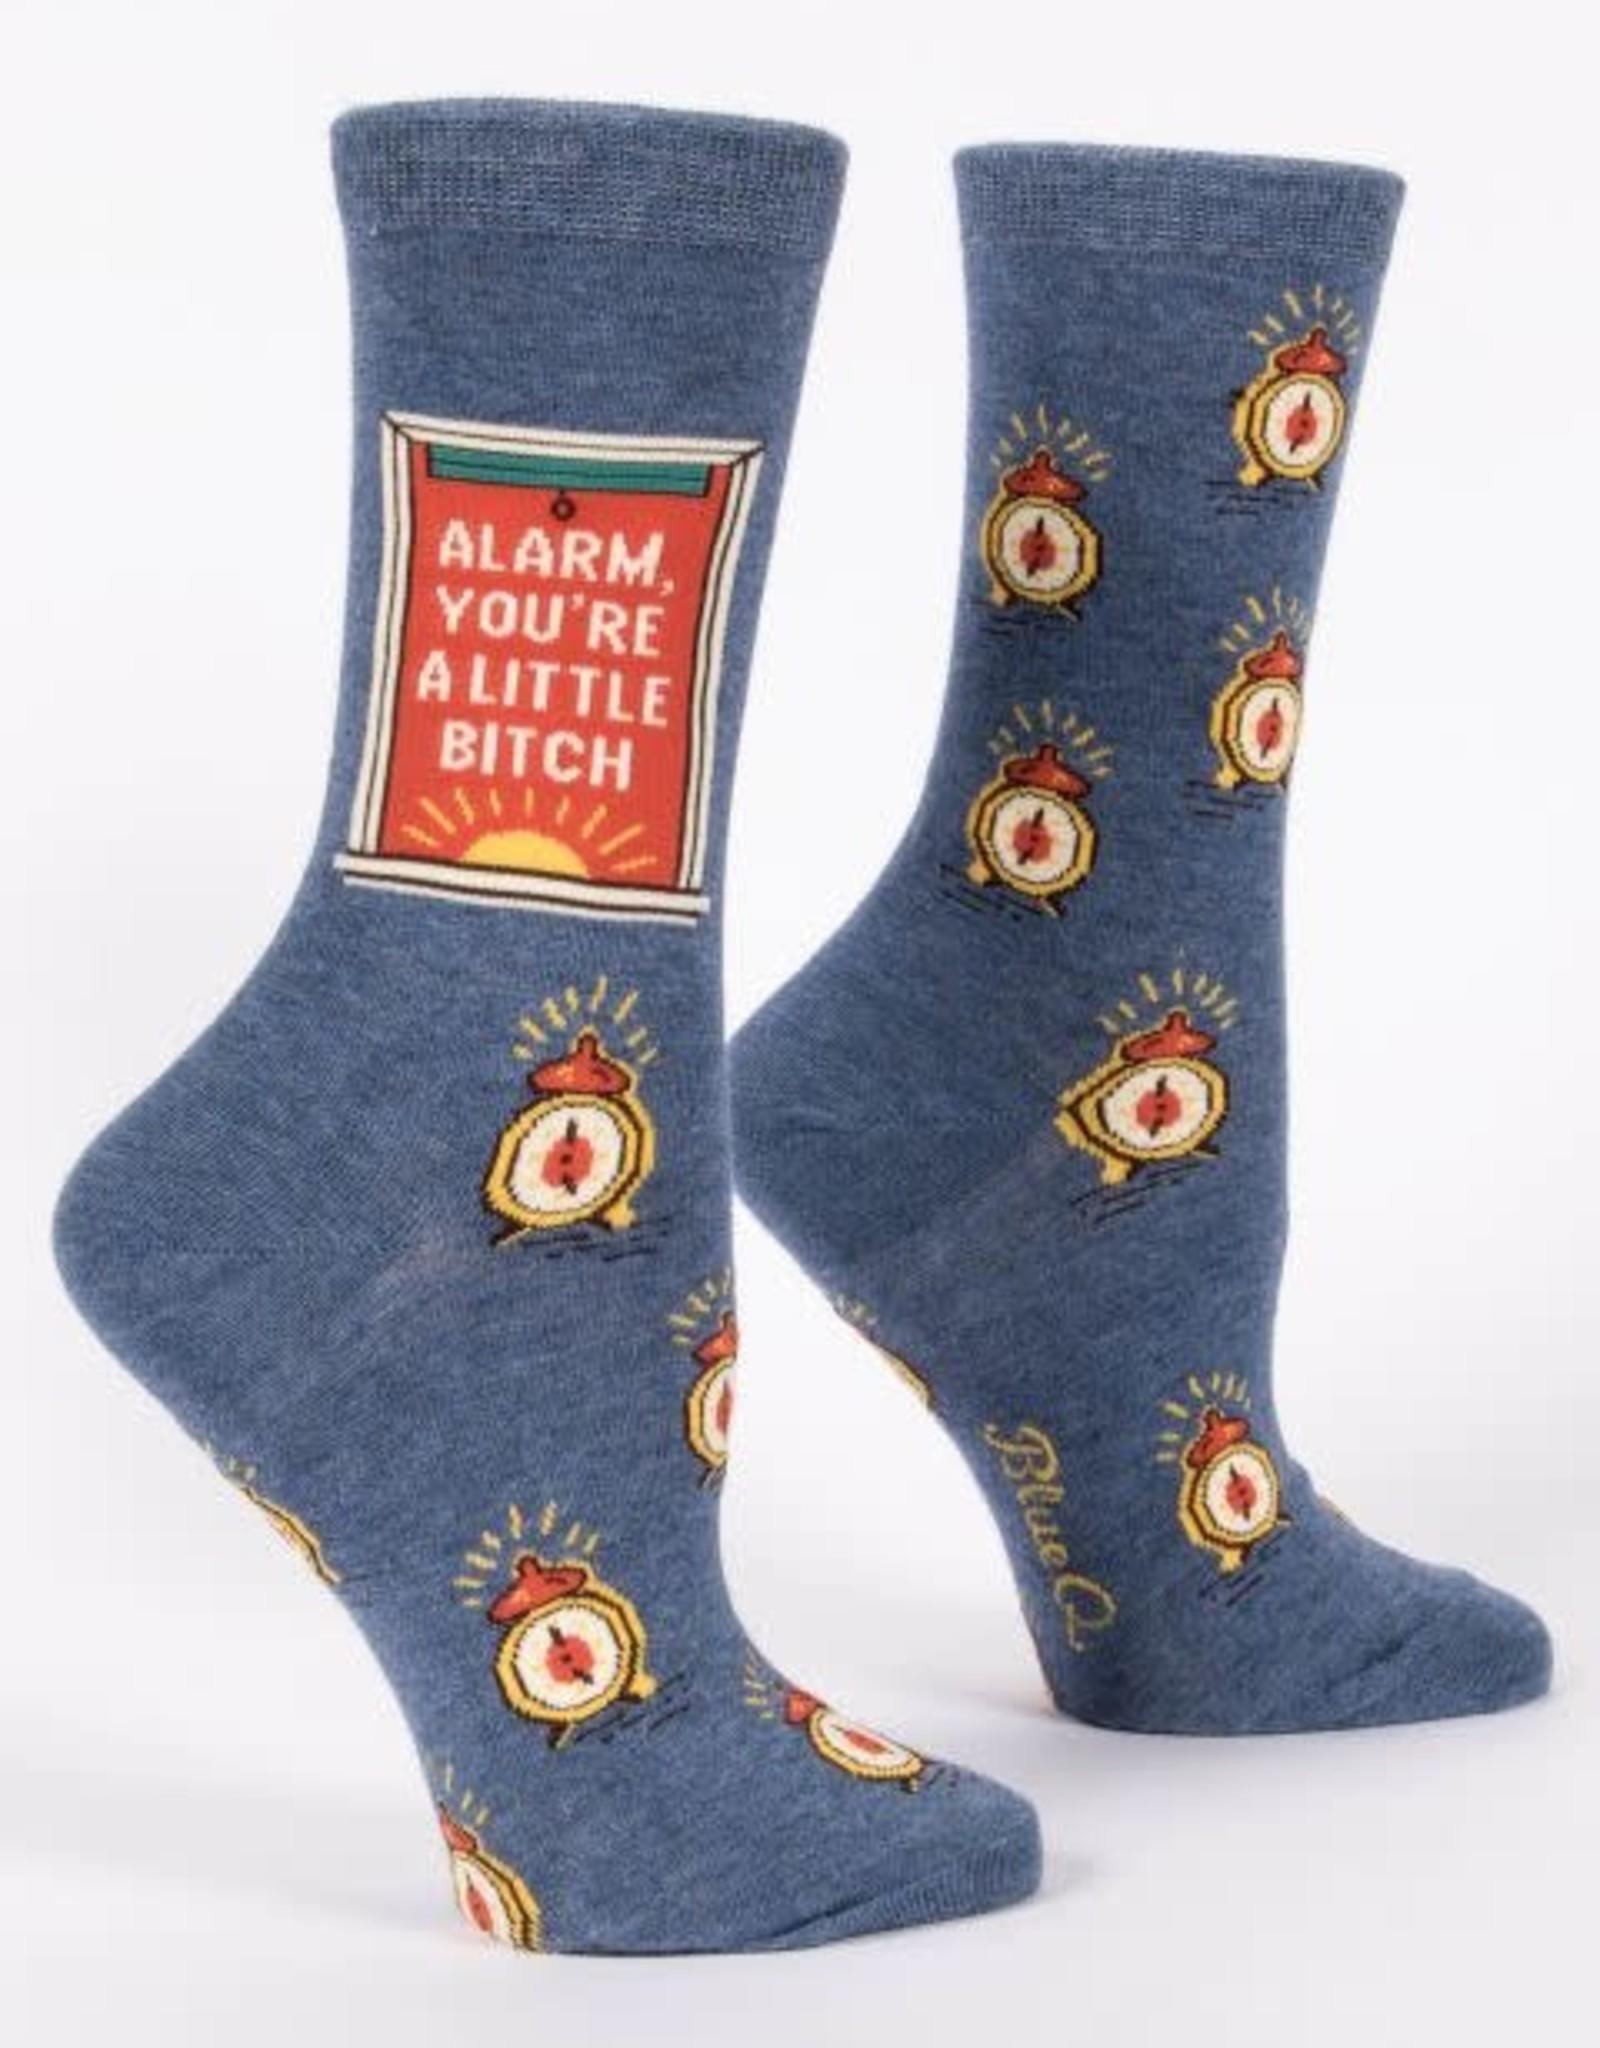 Alarm Bitch Crew Socks